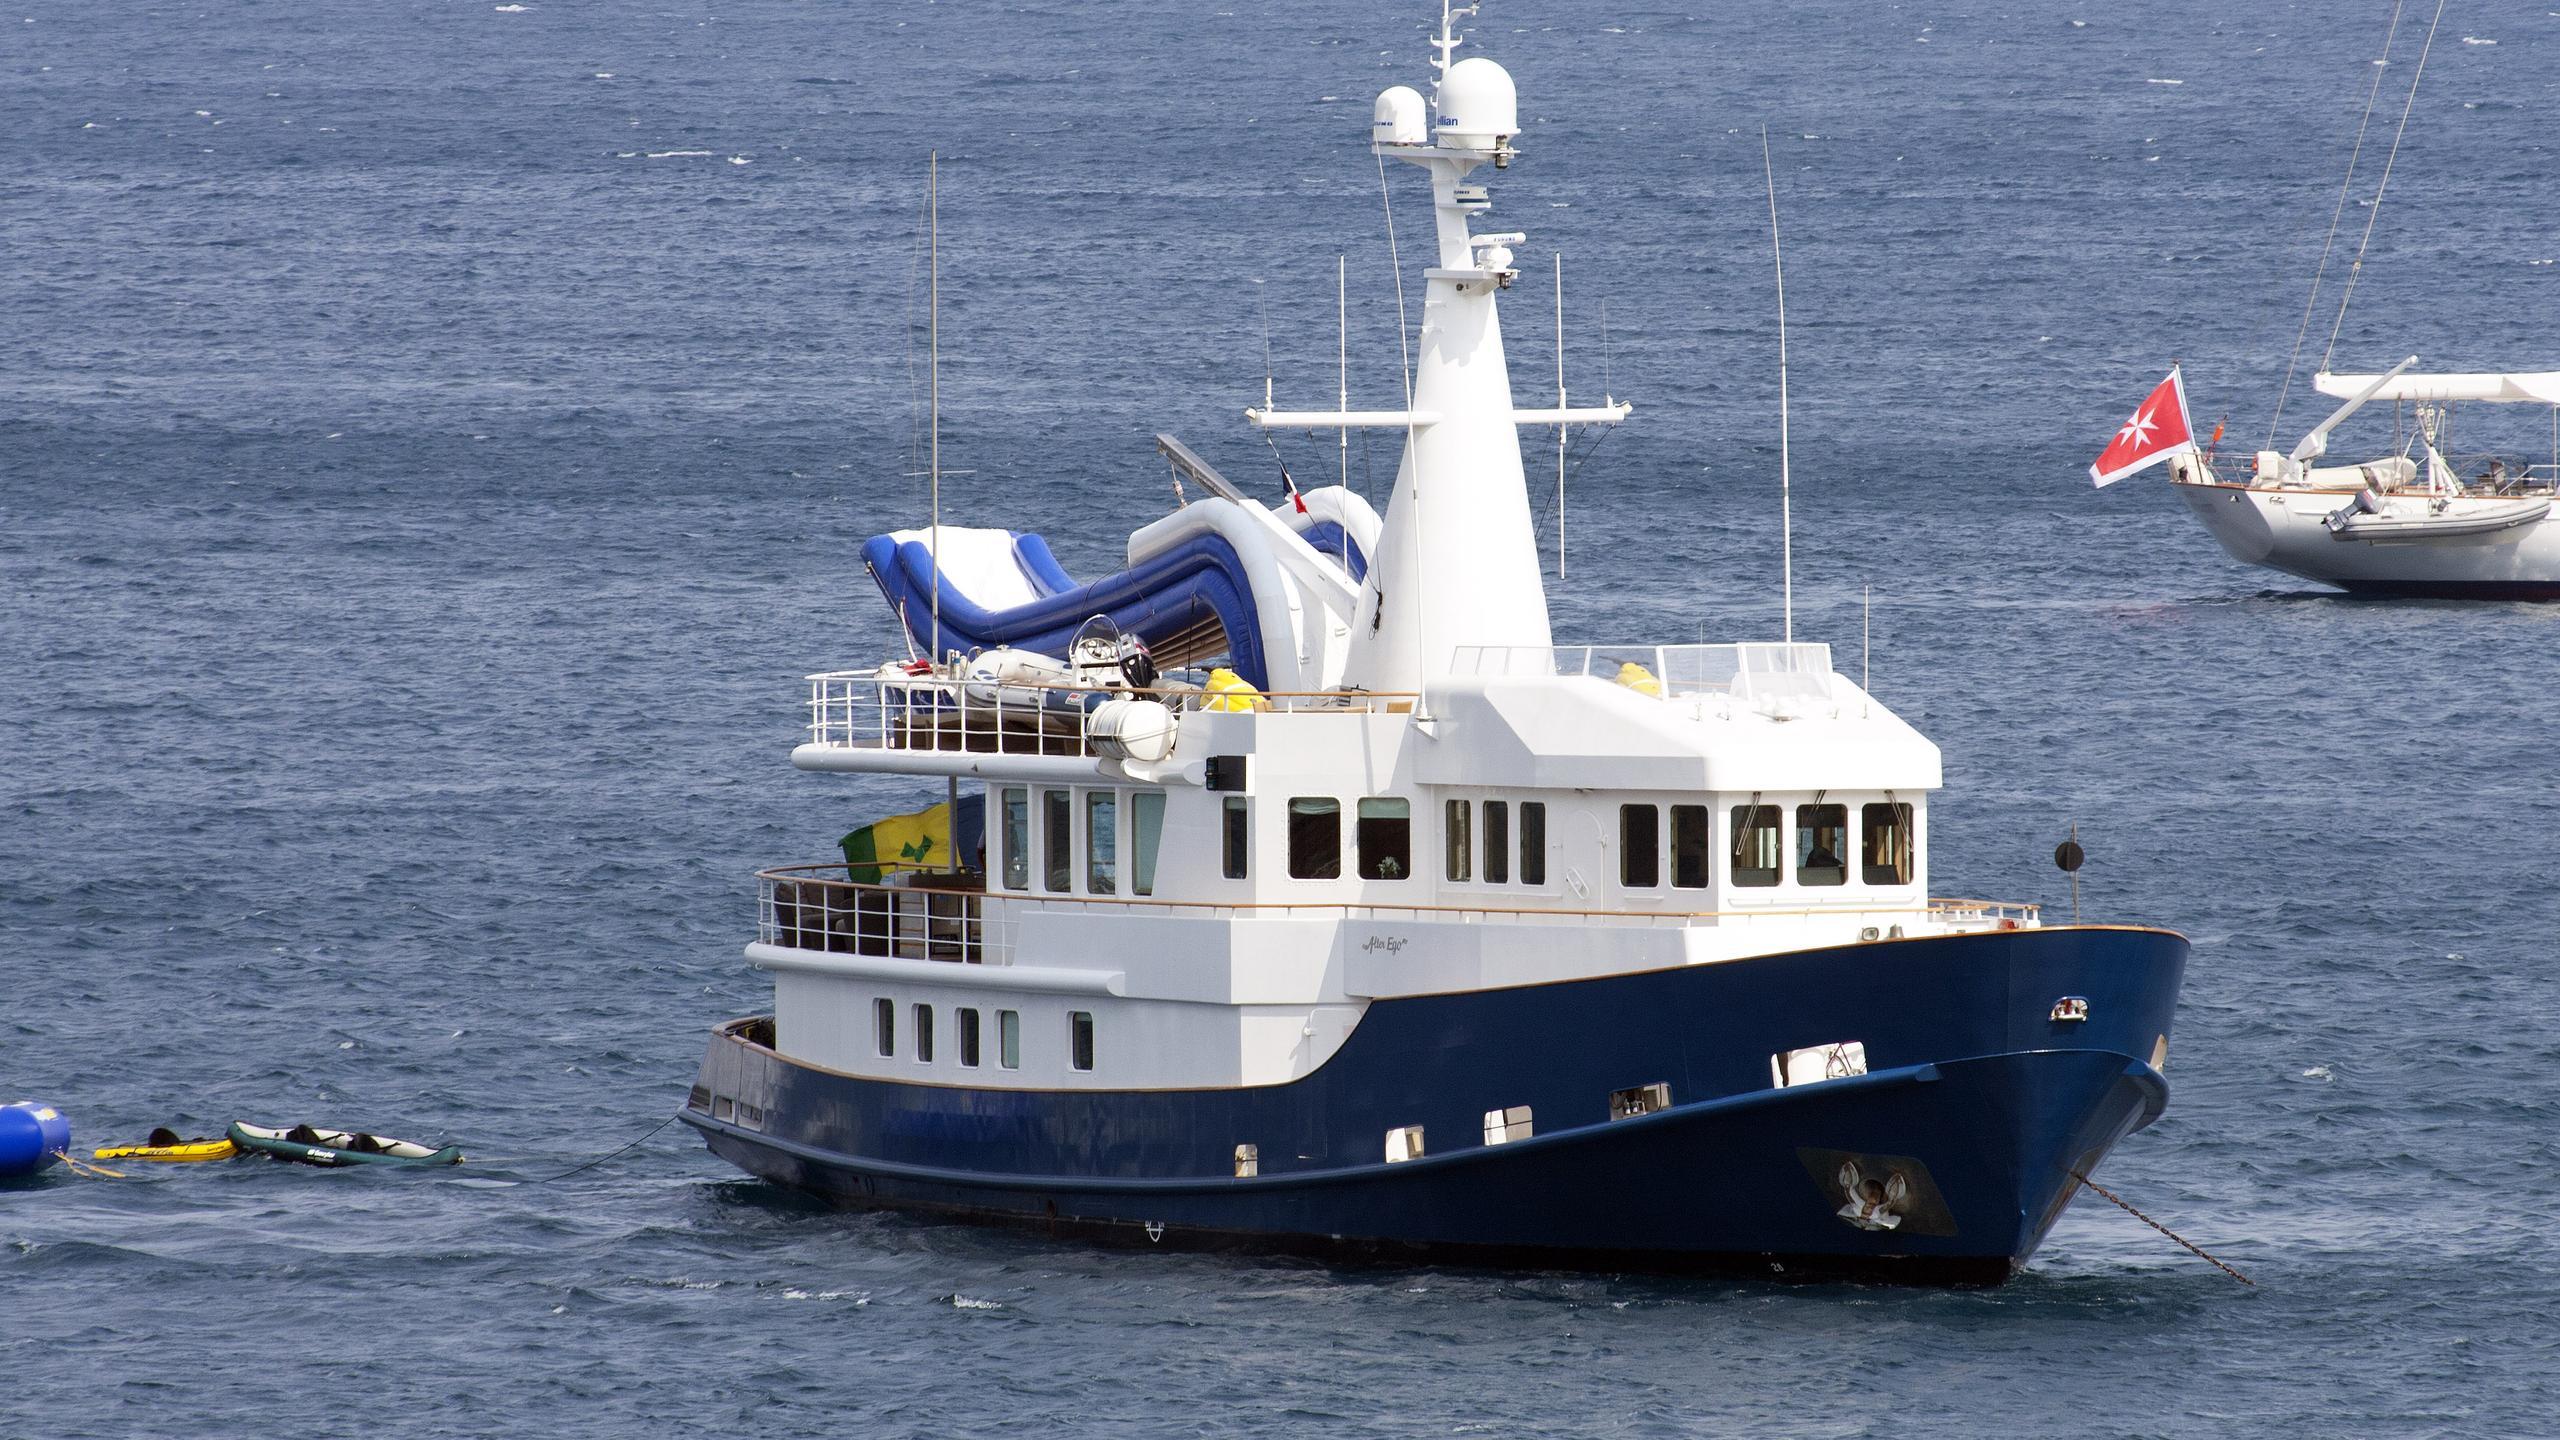 alter-ego-explorer-yacht-veb-j-warnke-1992-34m-half-profile